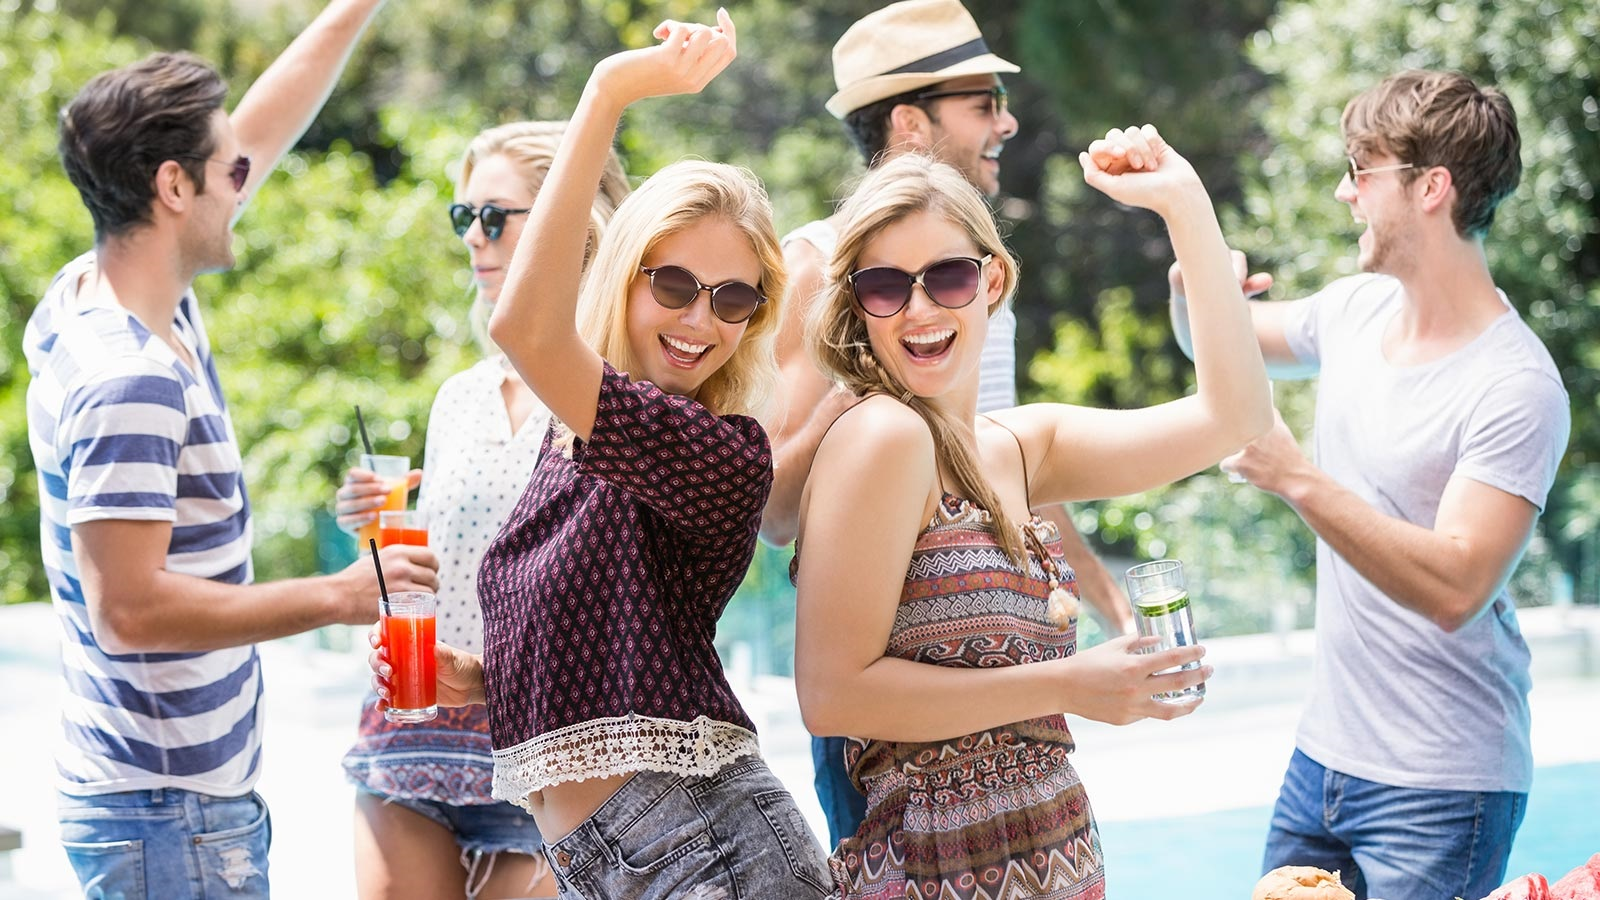 Circular sunglasses trend